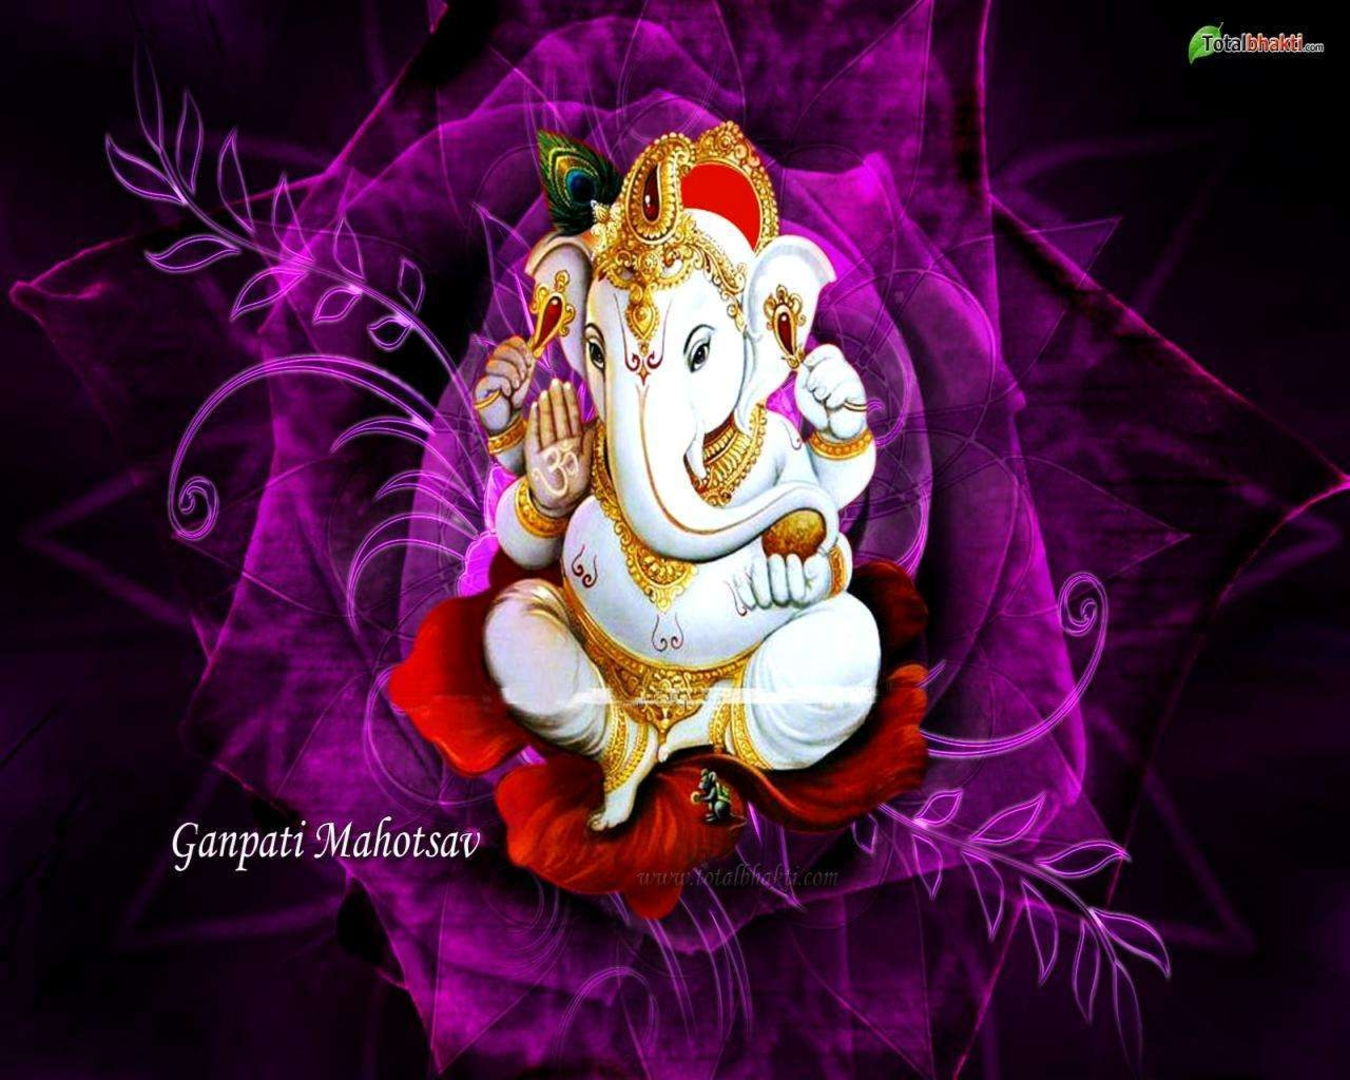 1920x1080 pixel Desktop Wallpapers Wallpapers God Ganesh Hindu Lord 1350x1080